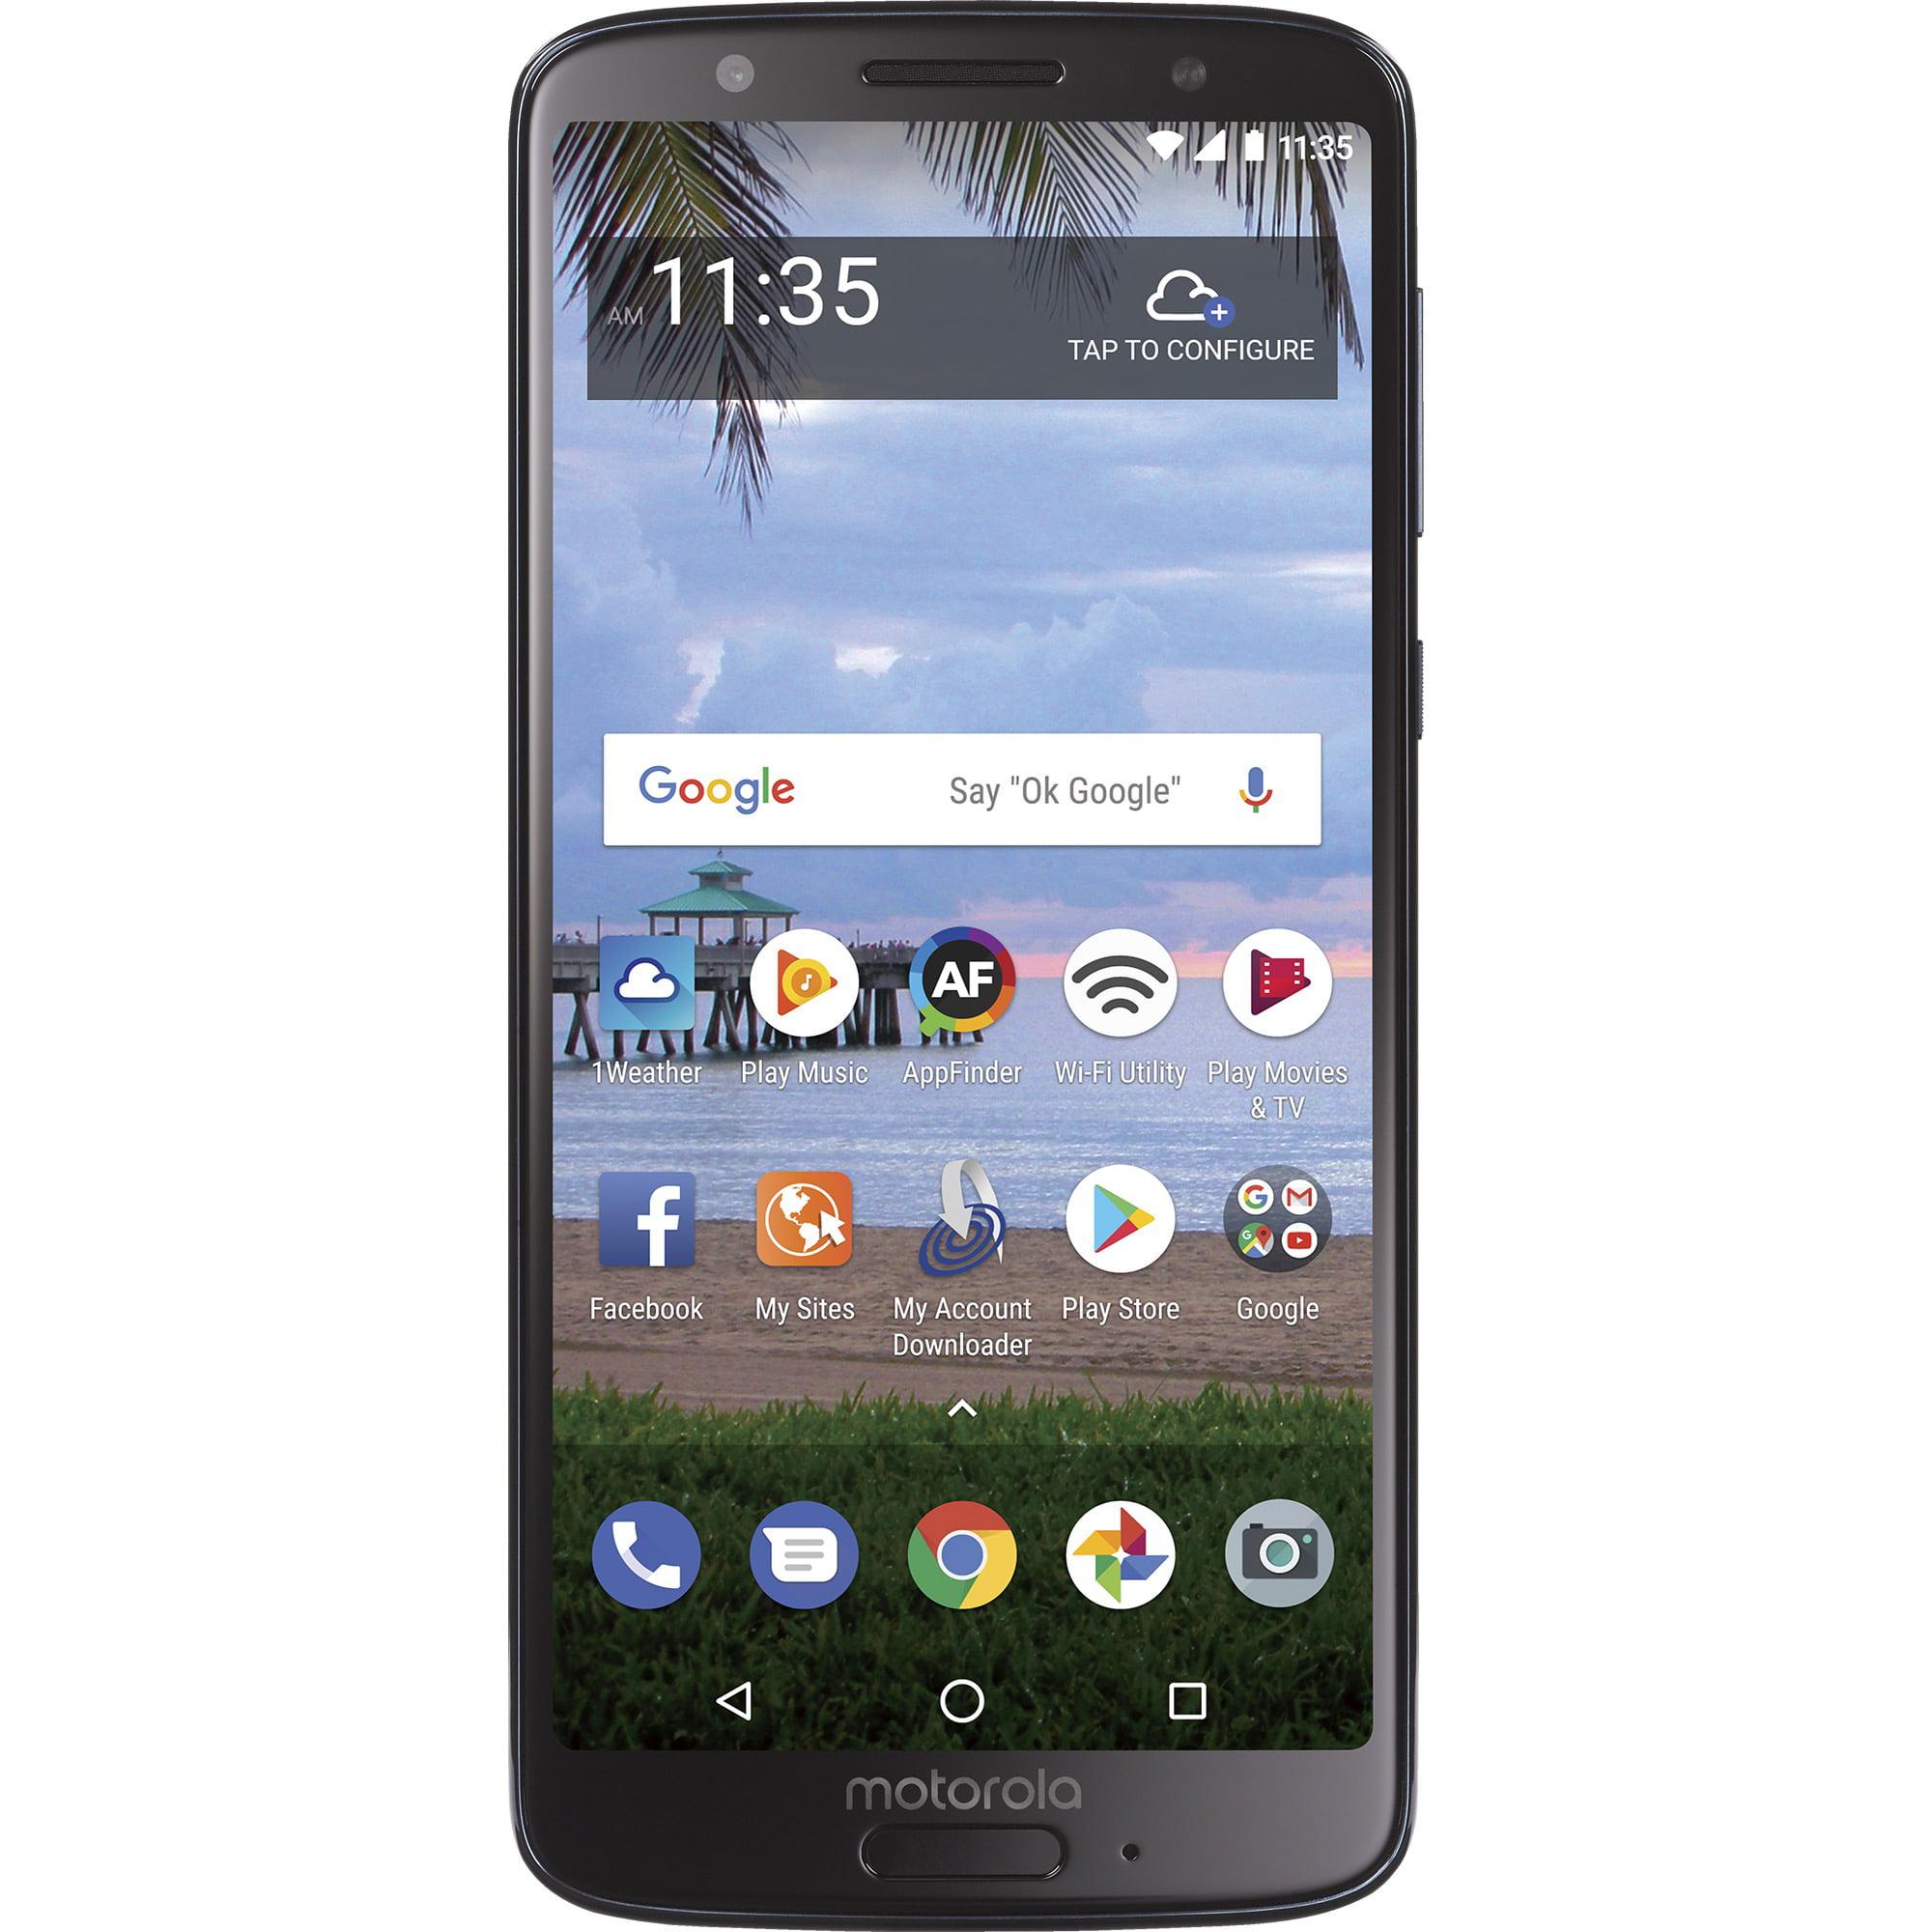 Simple Mobile Motorola XT1925DL Prepaid Smartphone